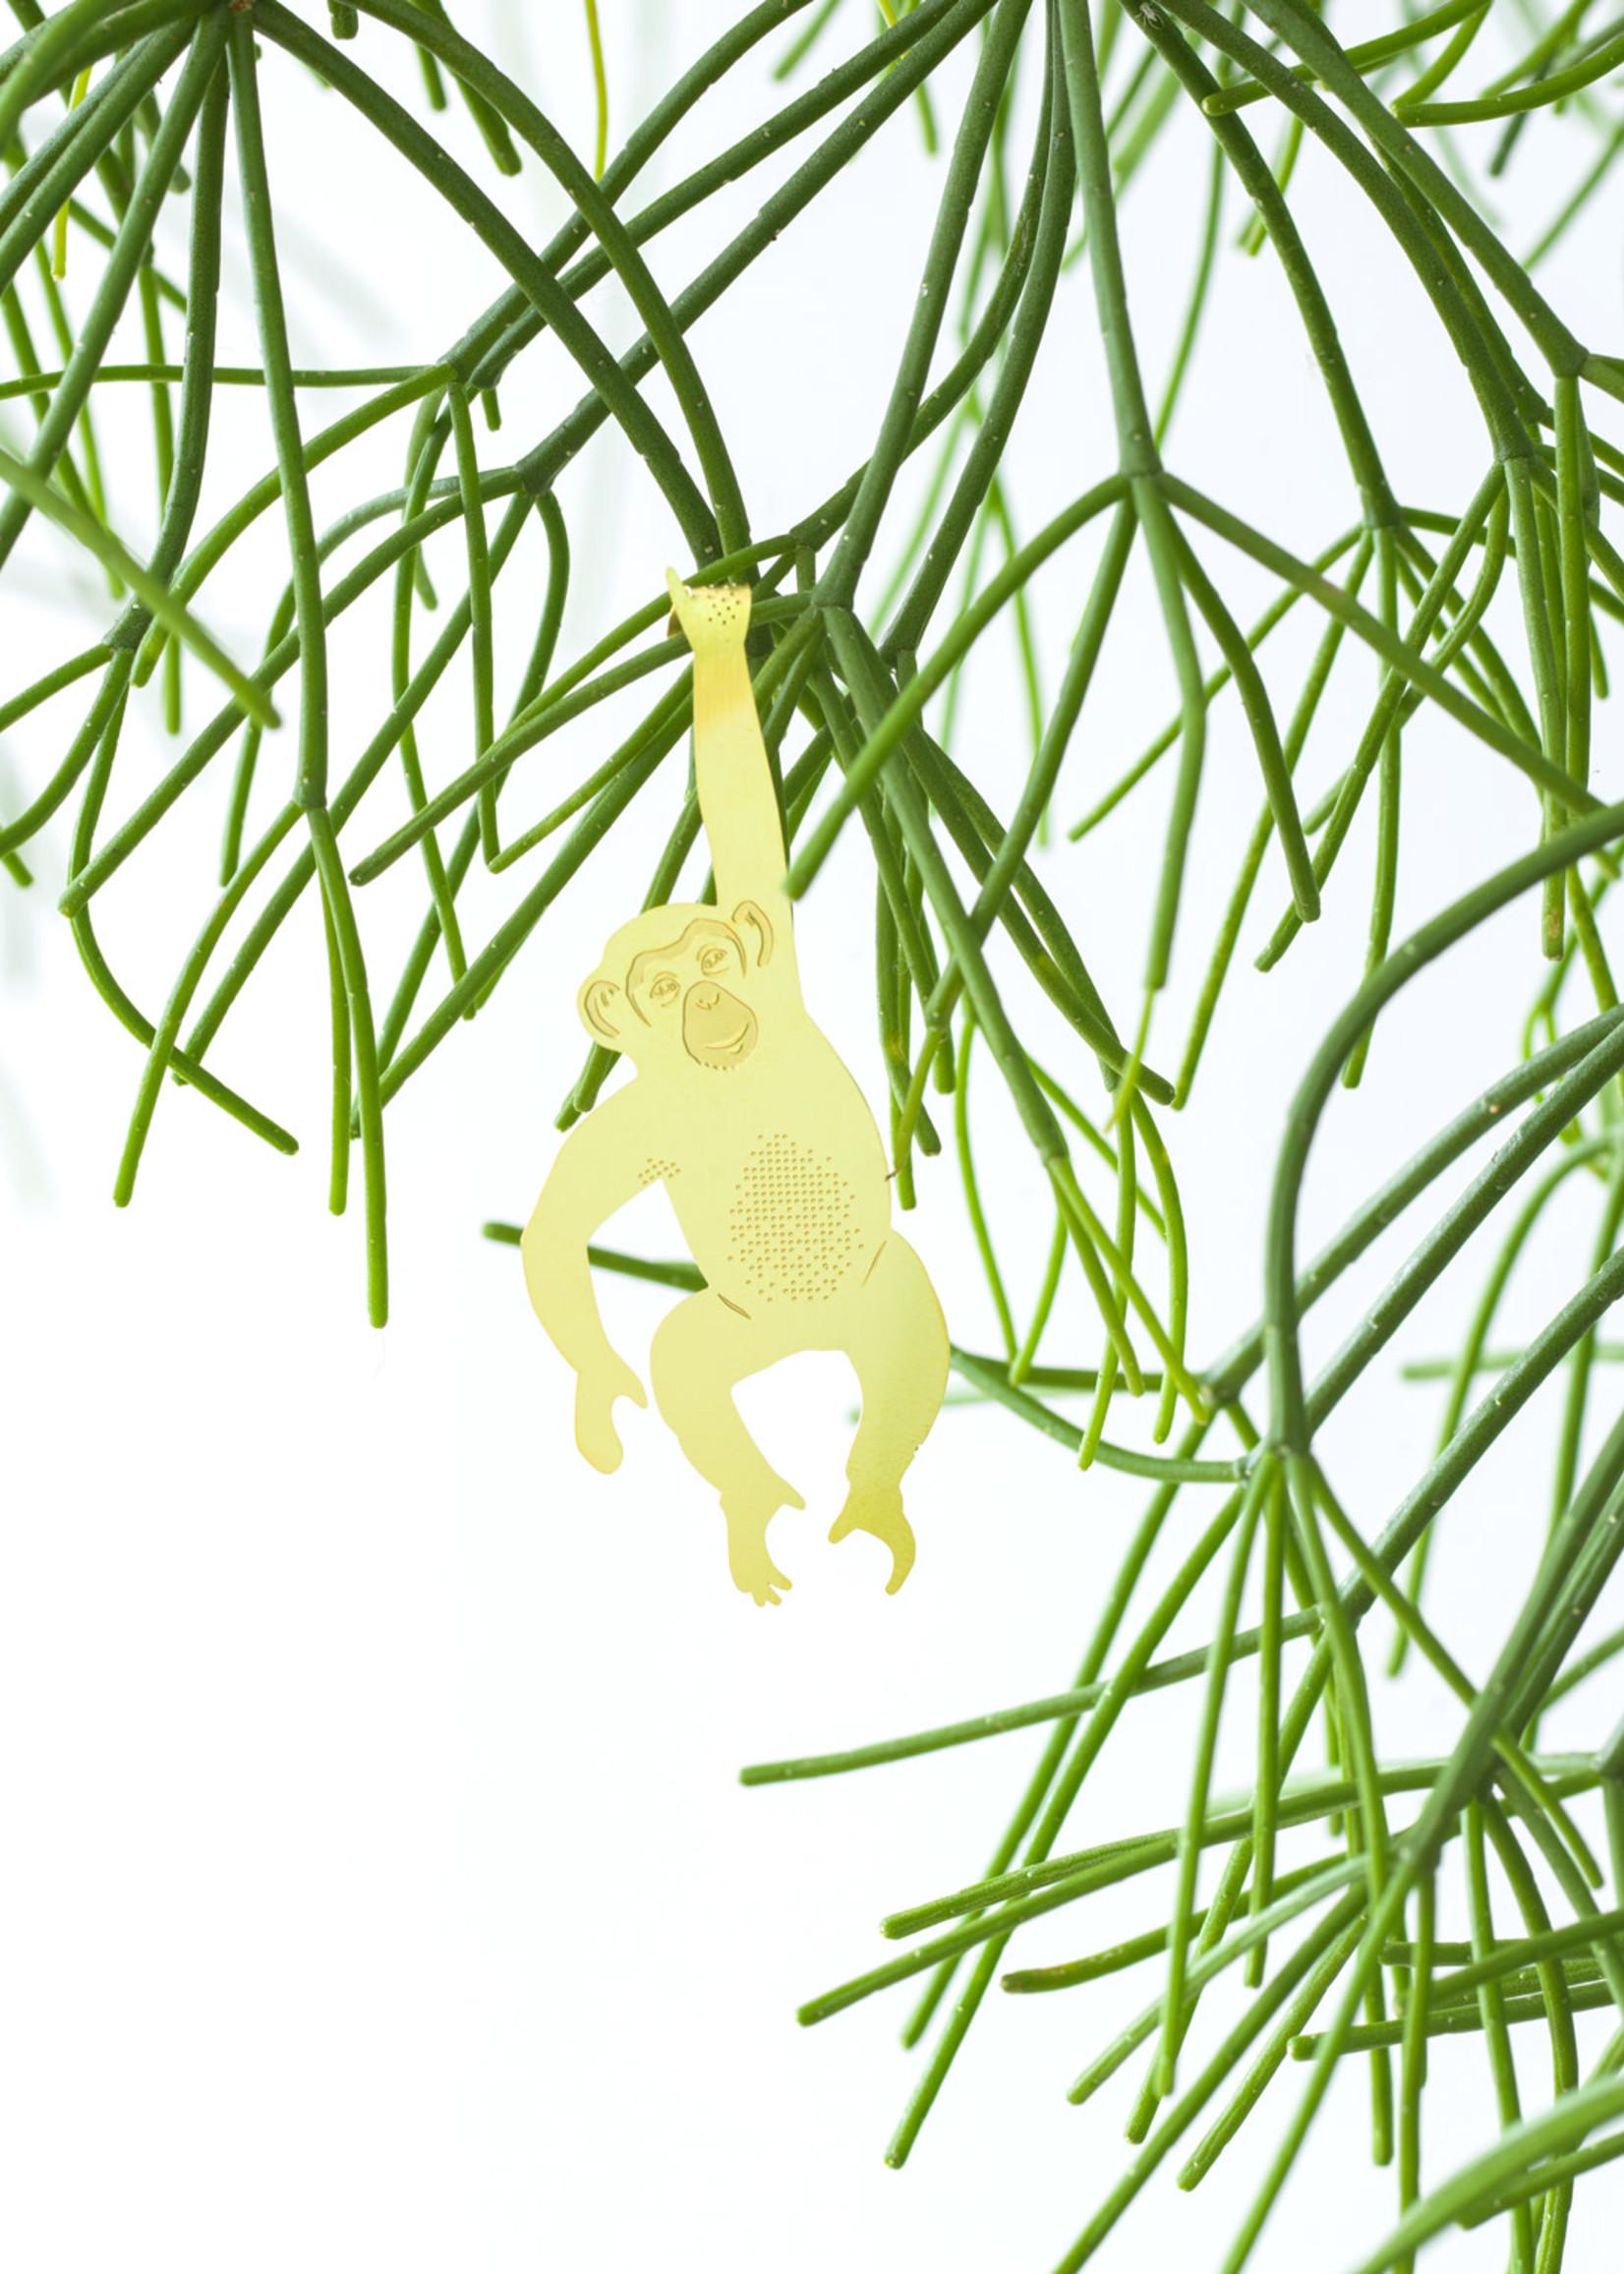 A.S Plant Animal CHIMPANSEE